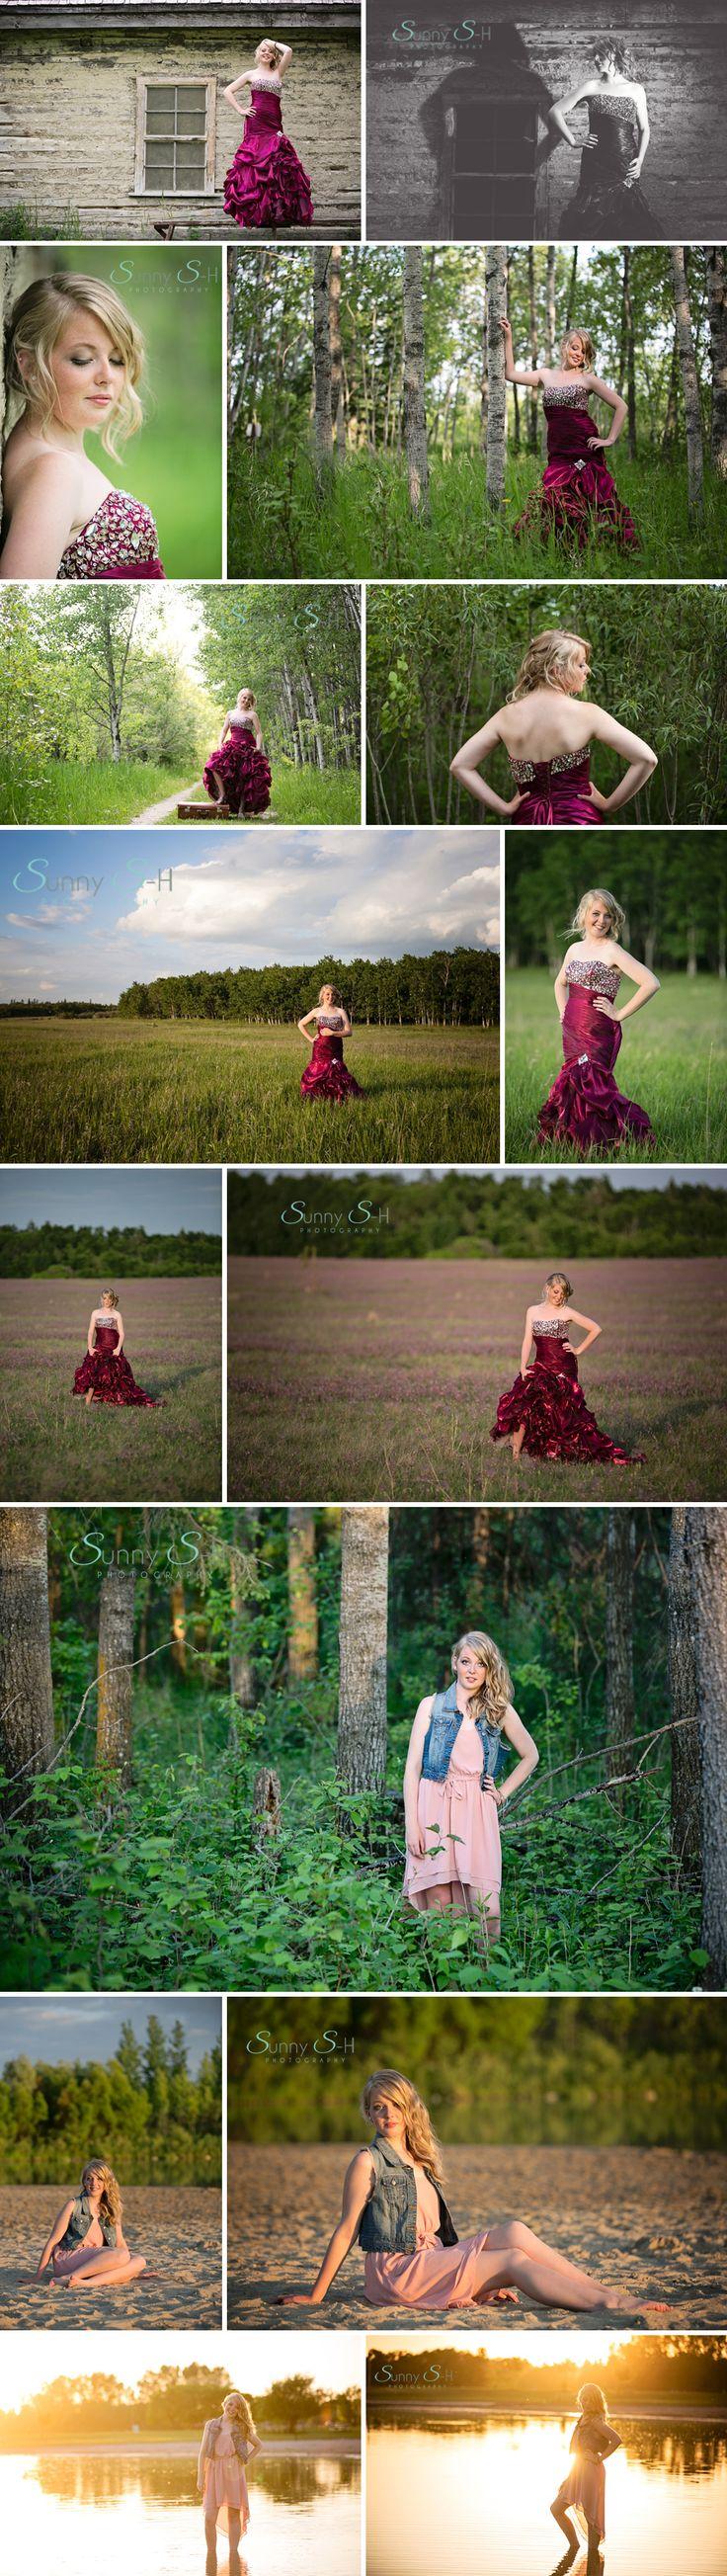 Rhian - Grad 2013 - Winnipeg Portrait Photographer, Sunny S-H Photography